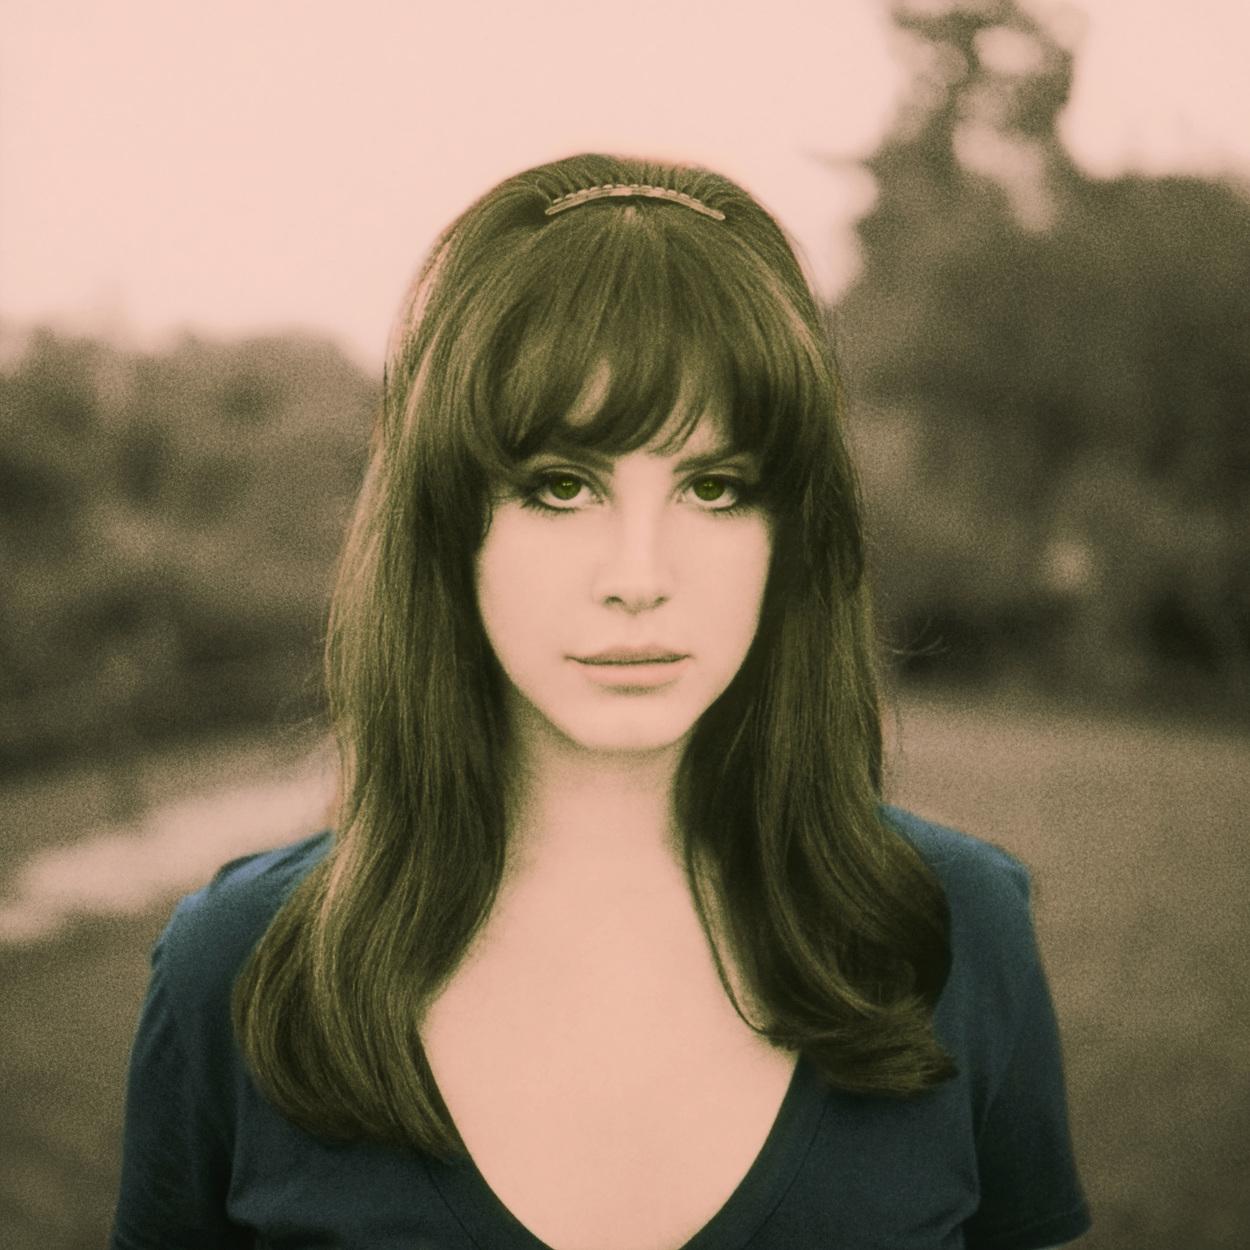 Lana Del Rey Cineastefilms Com Personal Network